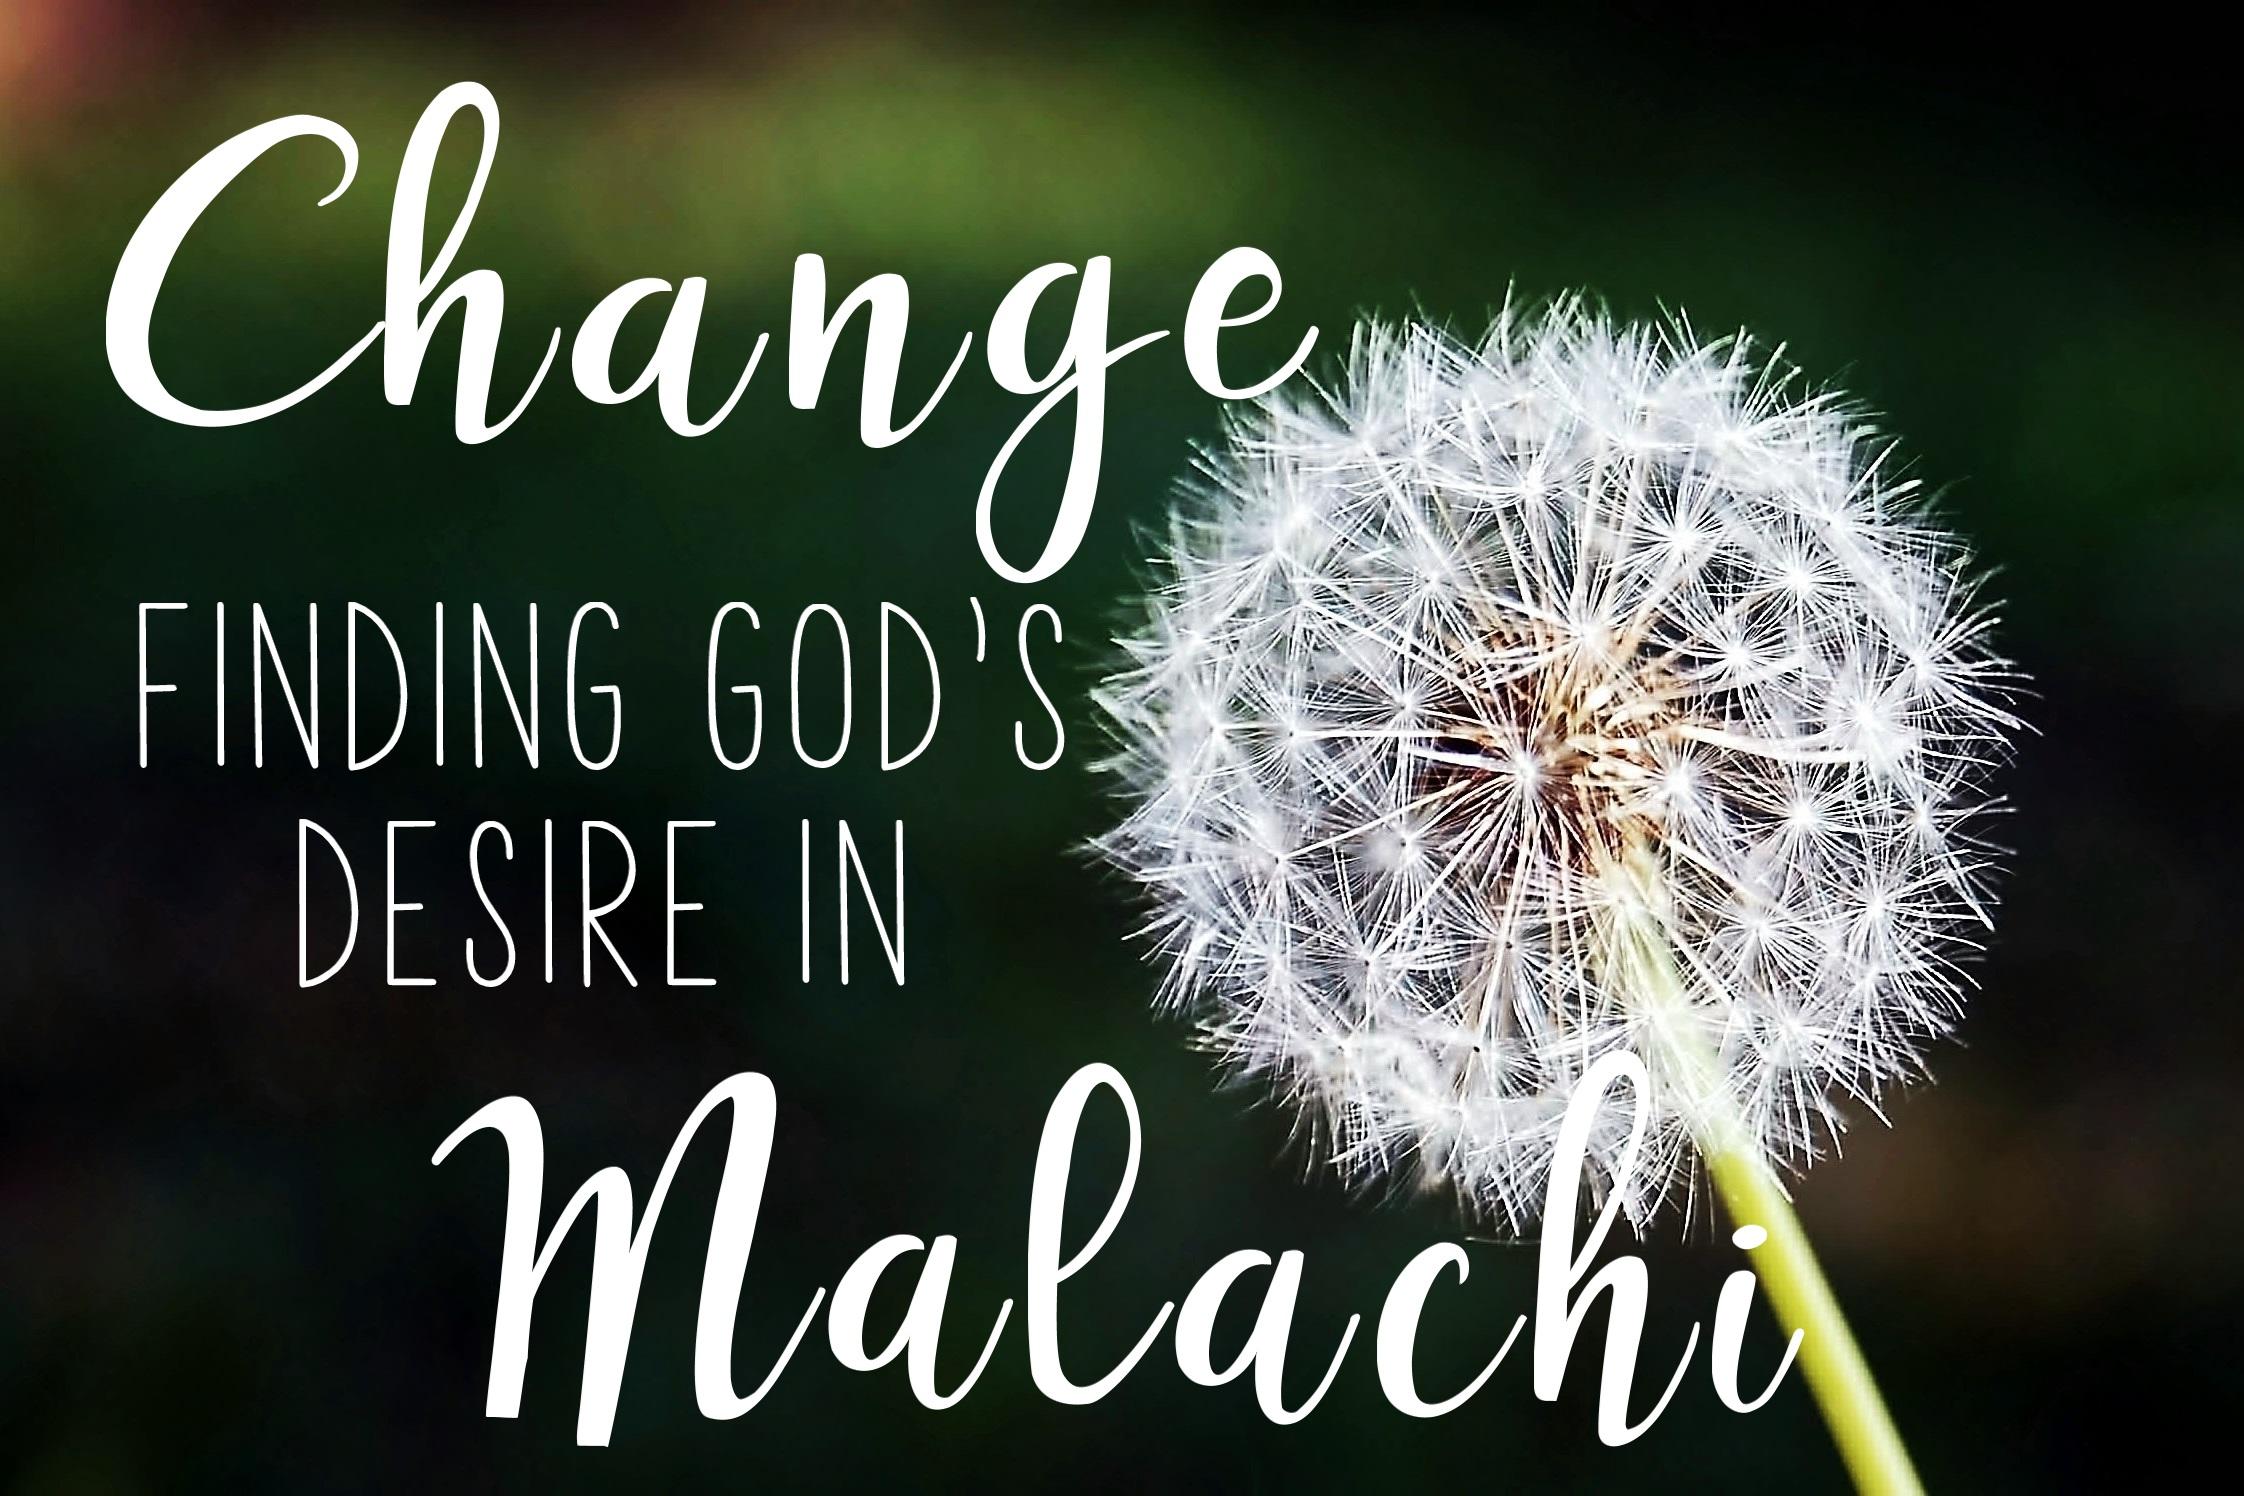 Malachi 3:13-4:6